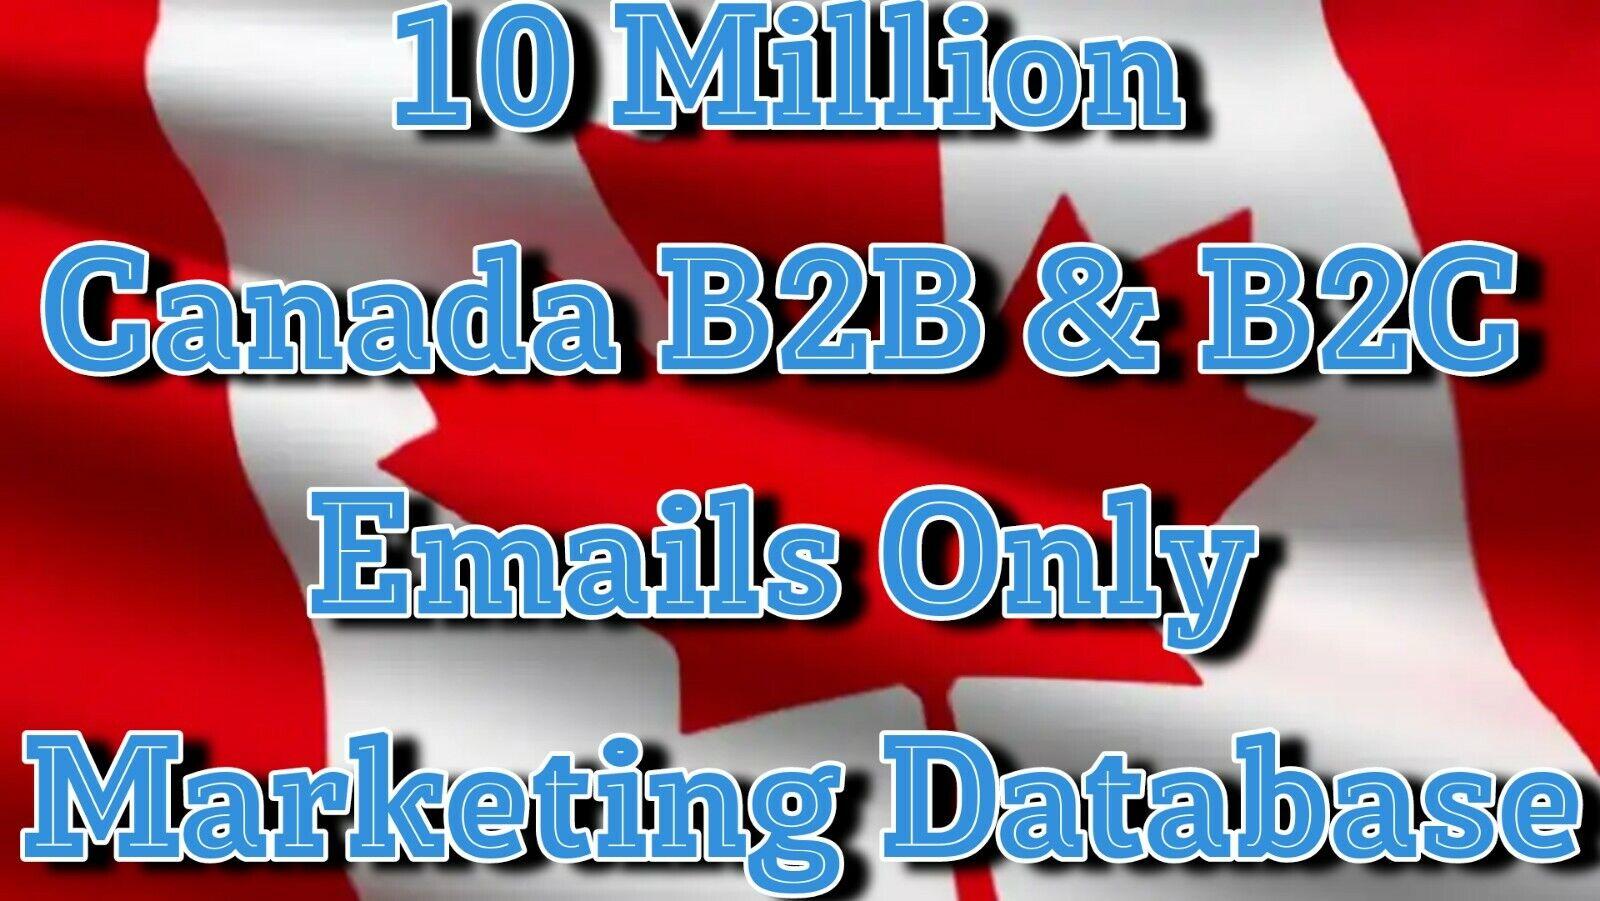 +10 Million CANADA B2B, B2C Only Email Database List Marketing